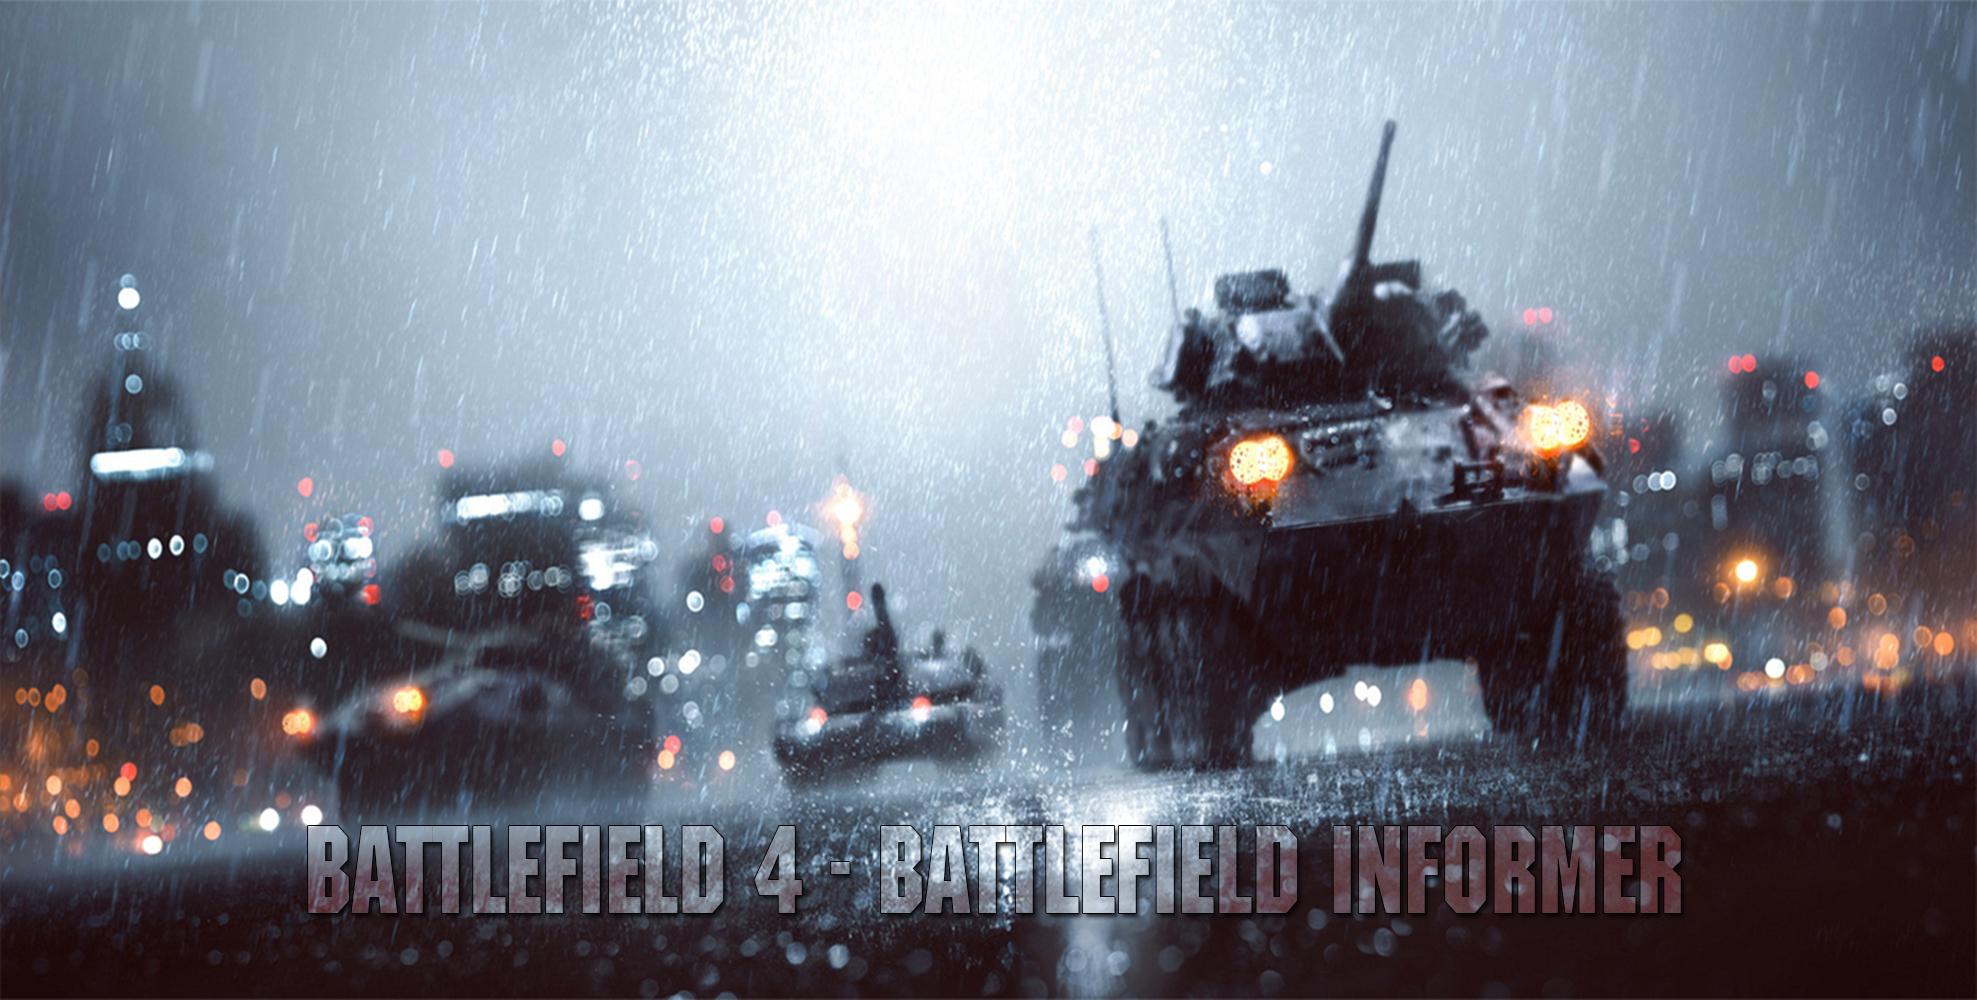 Battlefield 4 Wallpaper 1   Battlefield Informer Gallery 1977x1000